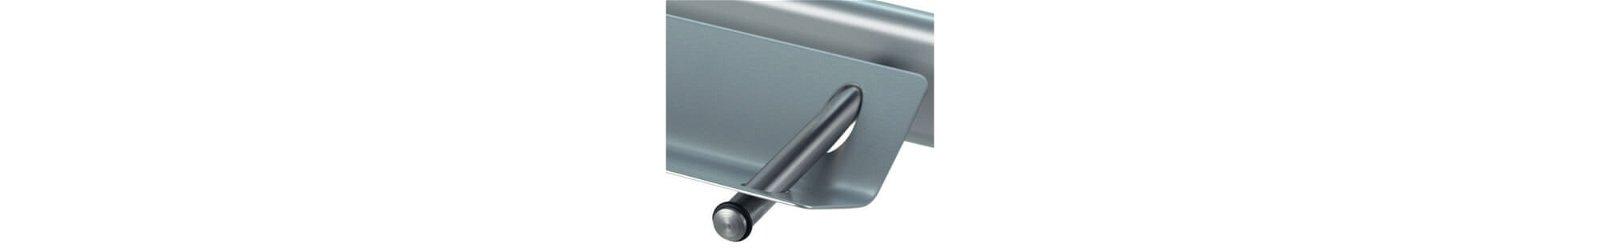 Mobiles Whiteboard MAULpro, drehbar, 100x210 cm, grau